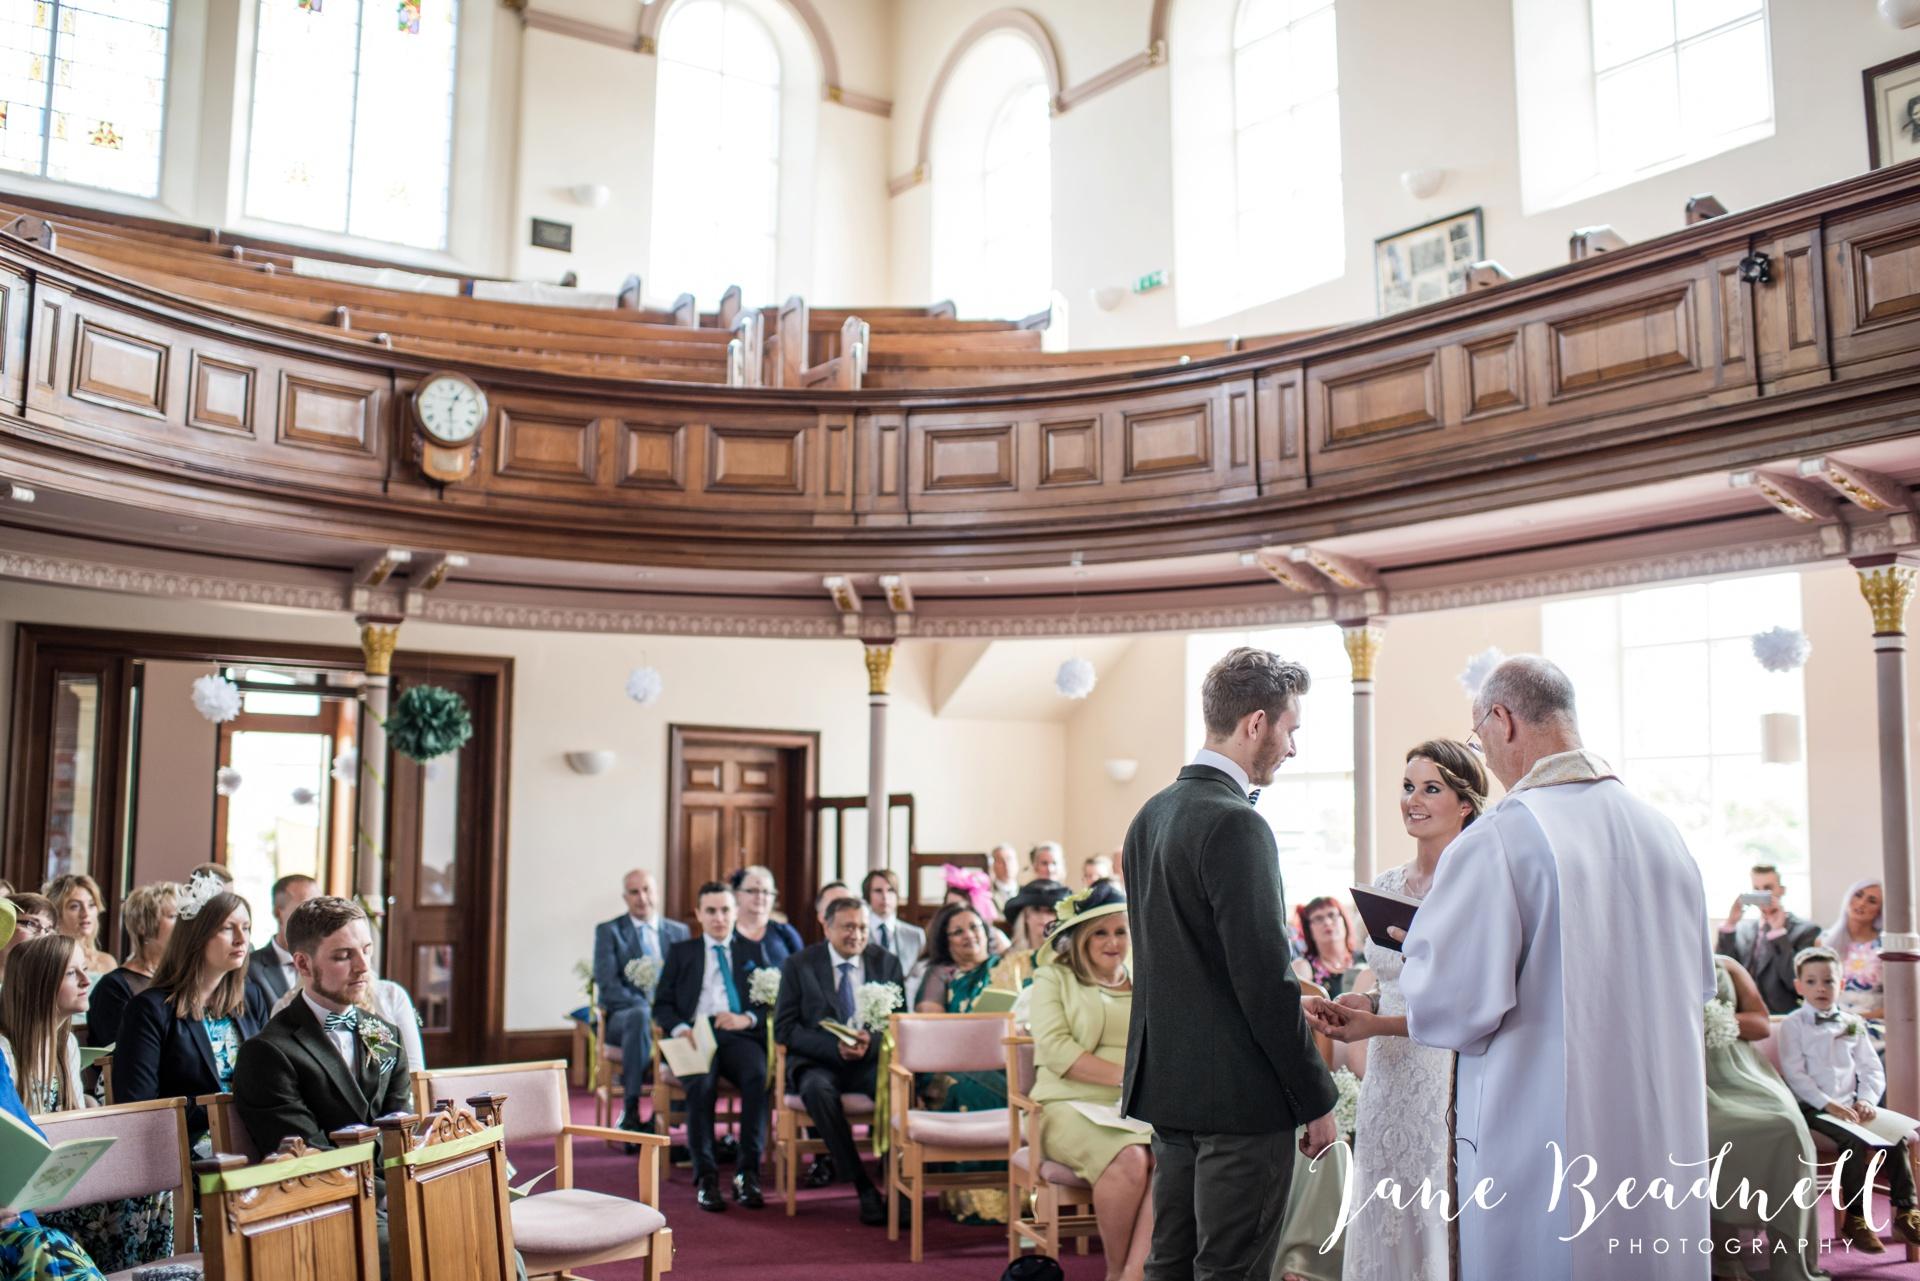 Jane Beadnell fine art wedding photographer The Old Deanery Ripon_0036